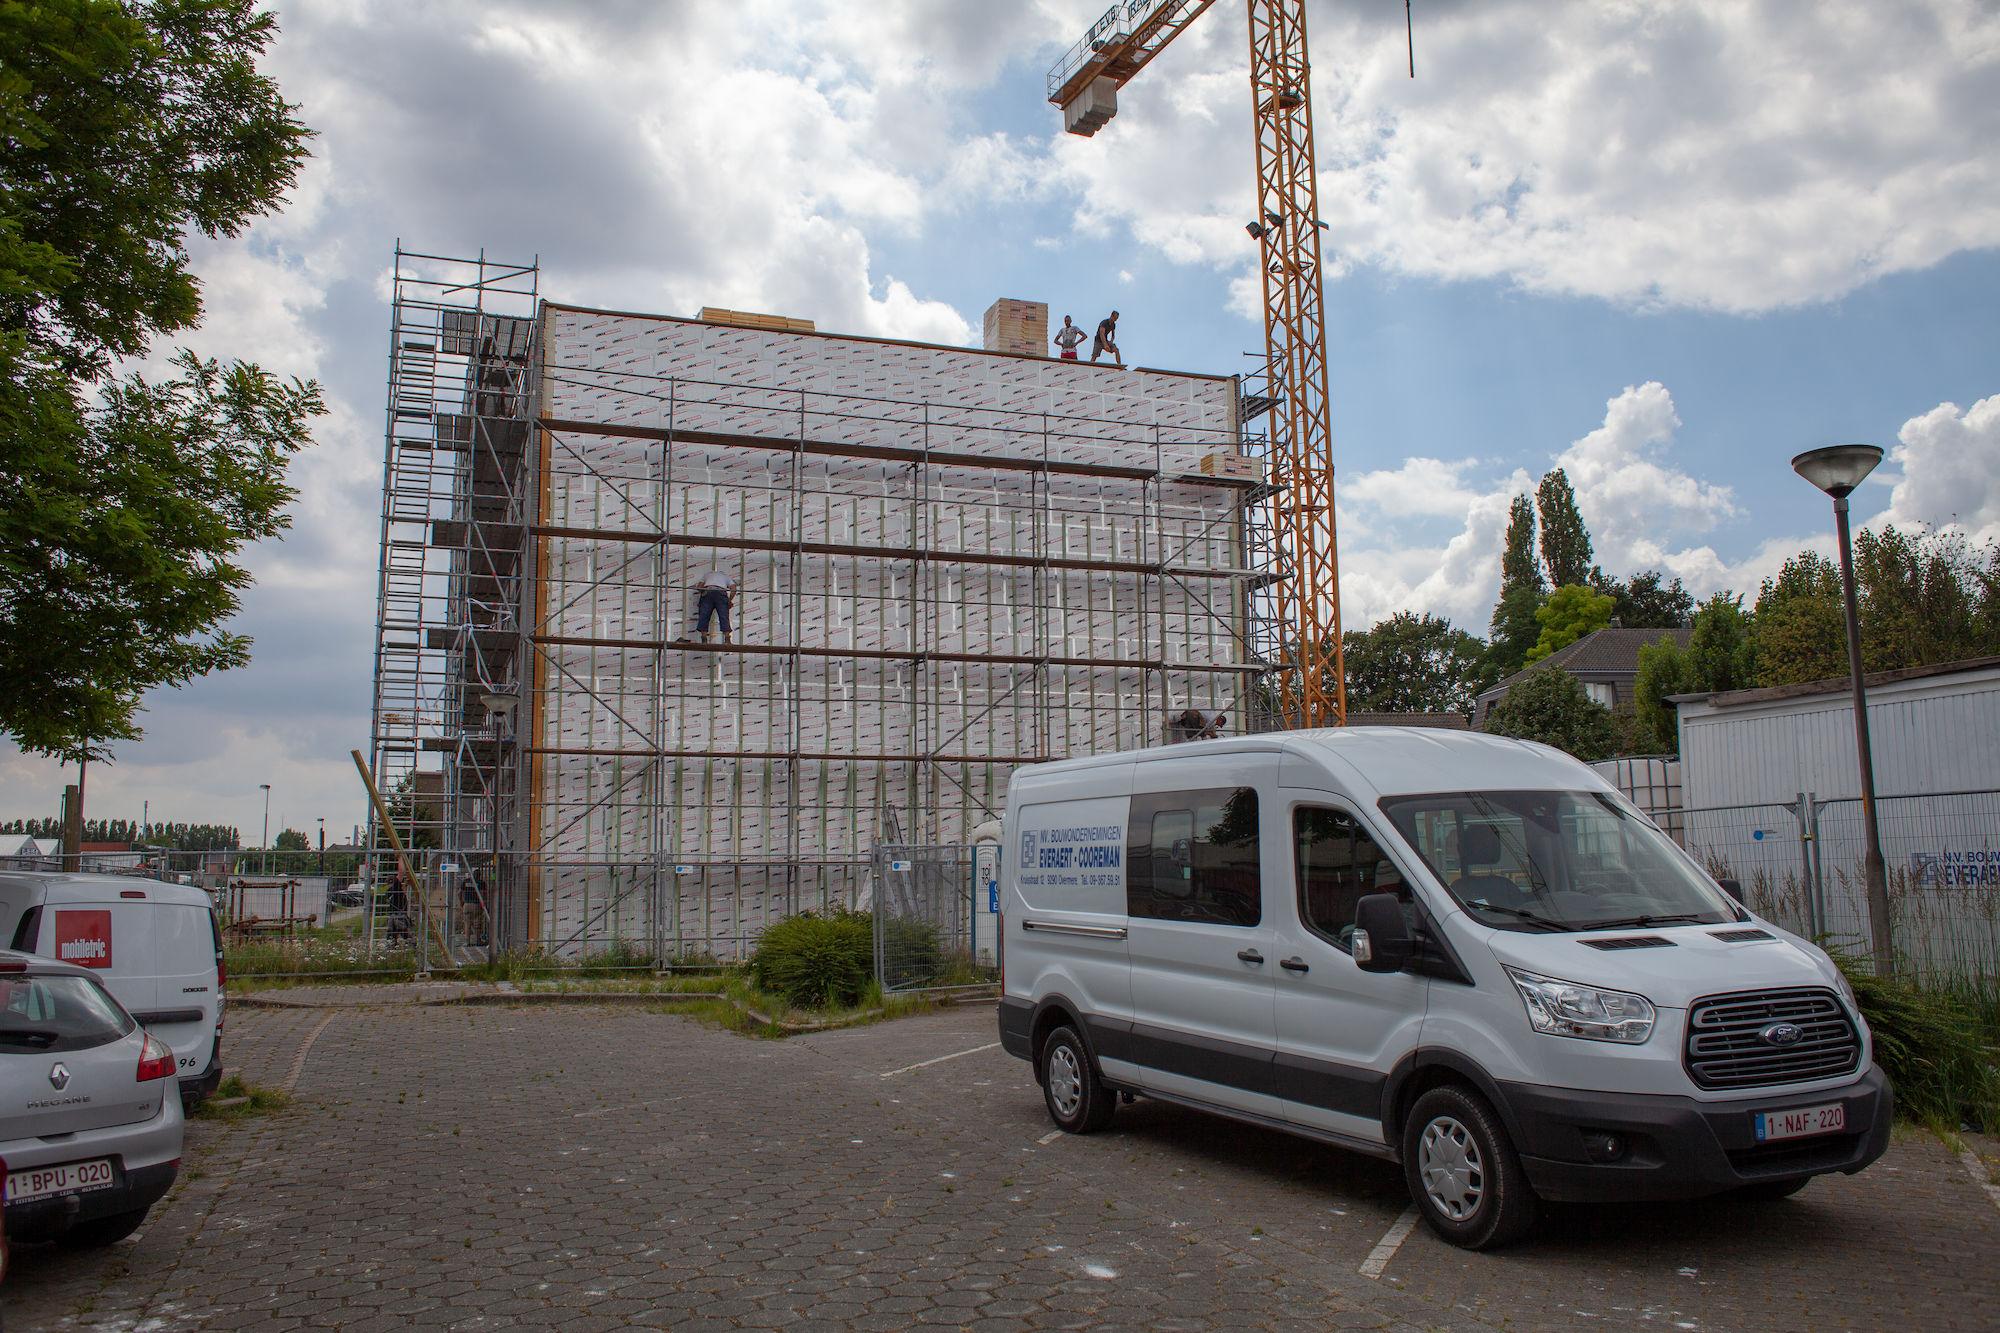 2019-07-02 Muide Meulestede prospectie Wannes_stadsvernieuwing_IMG_0322-3.jpg